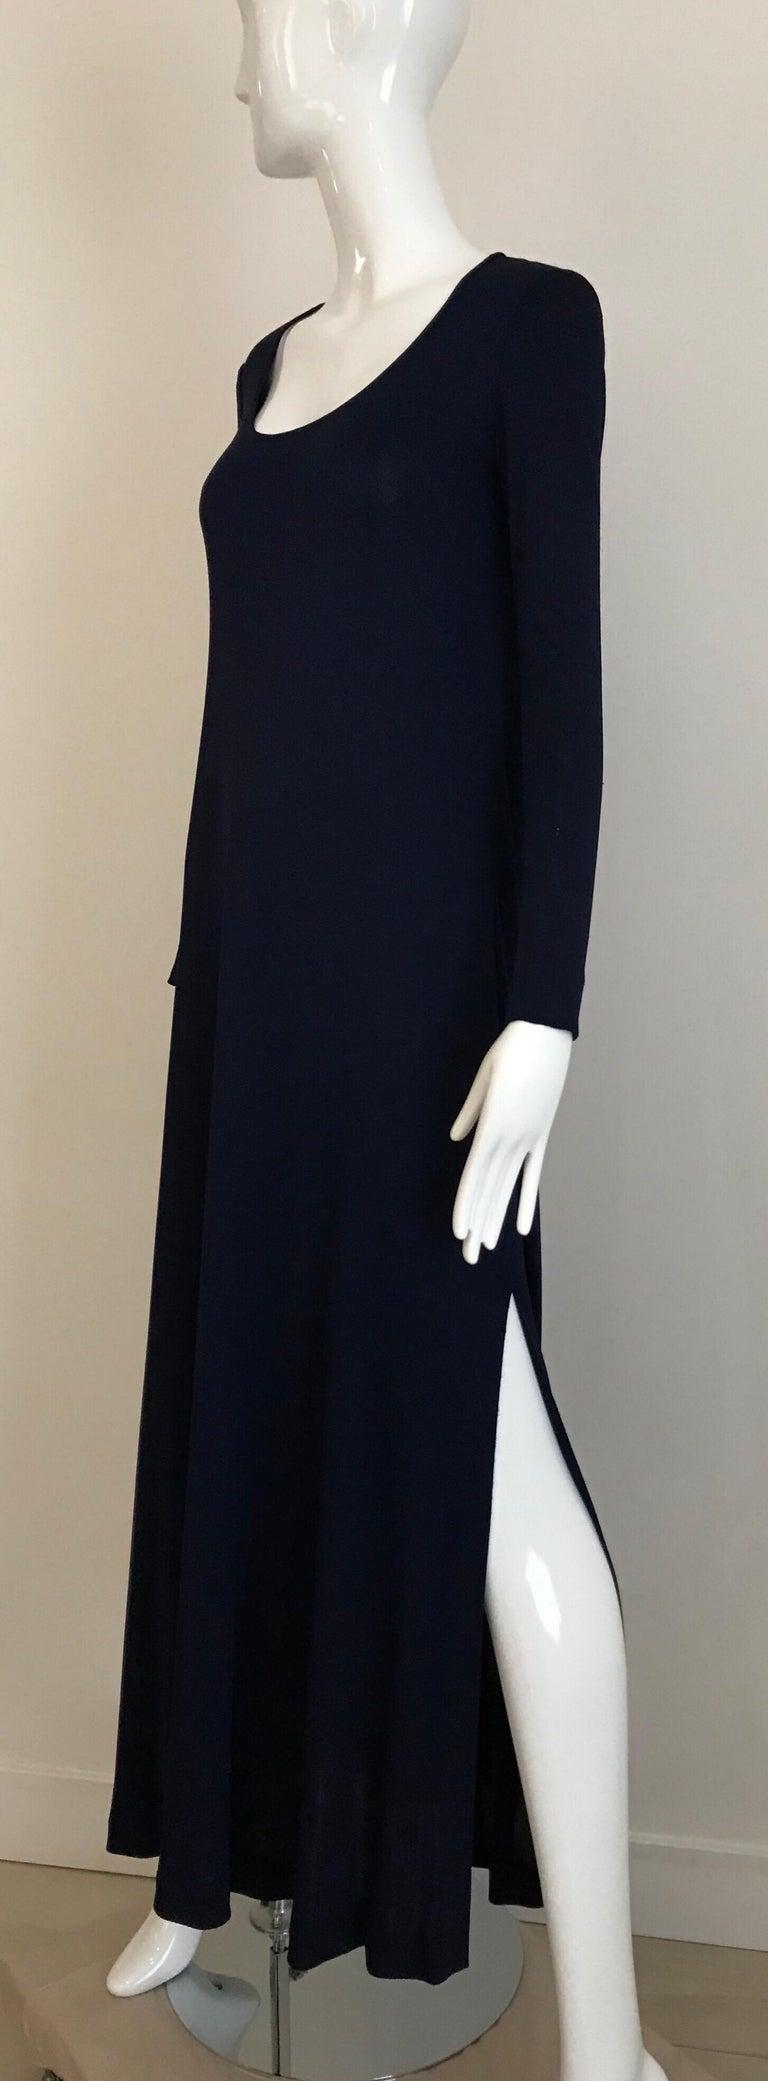 1970s Halston Blue Jersey Dress For Sale 1